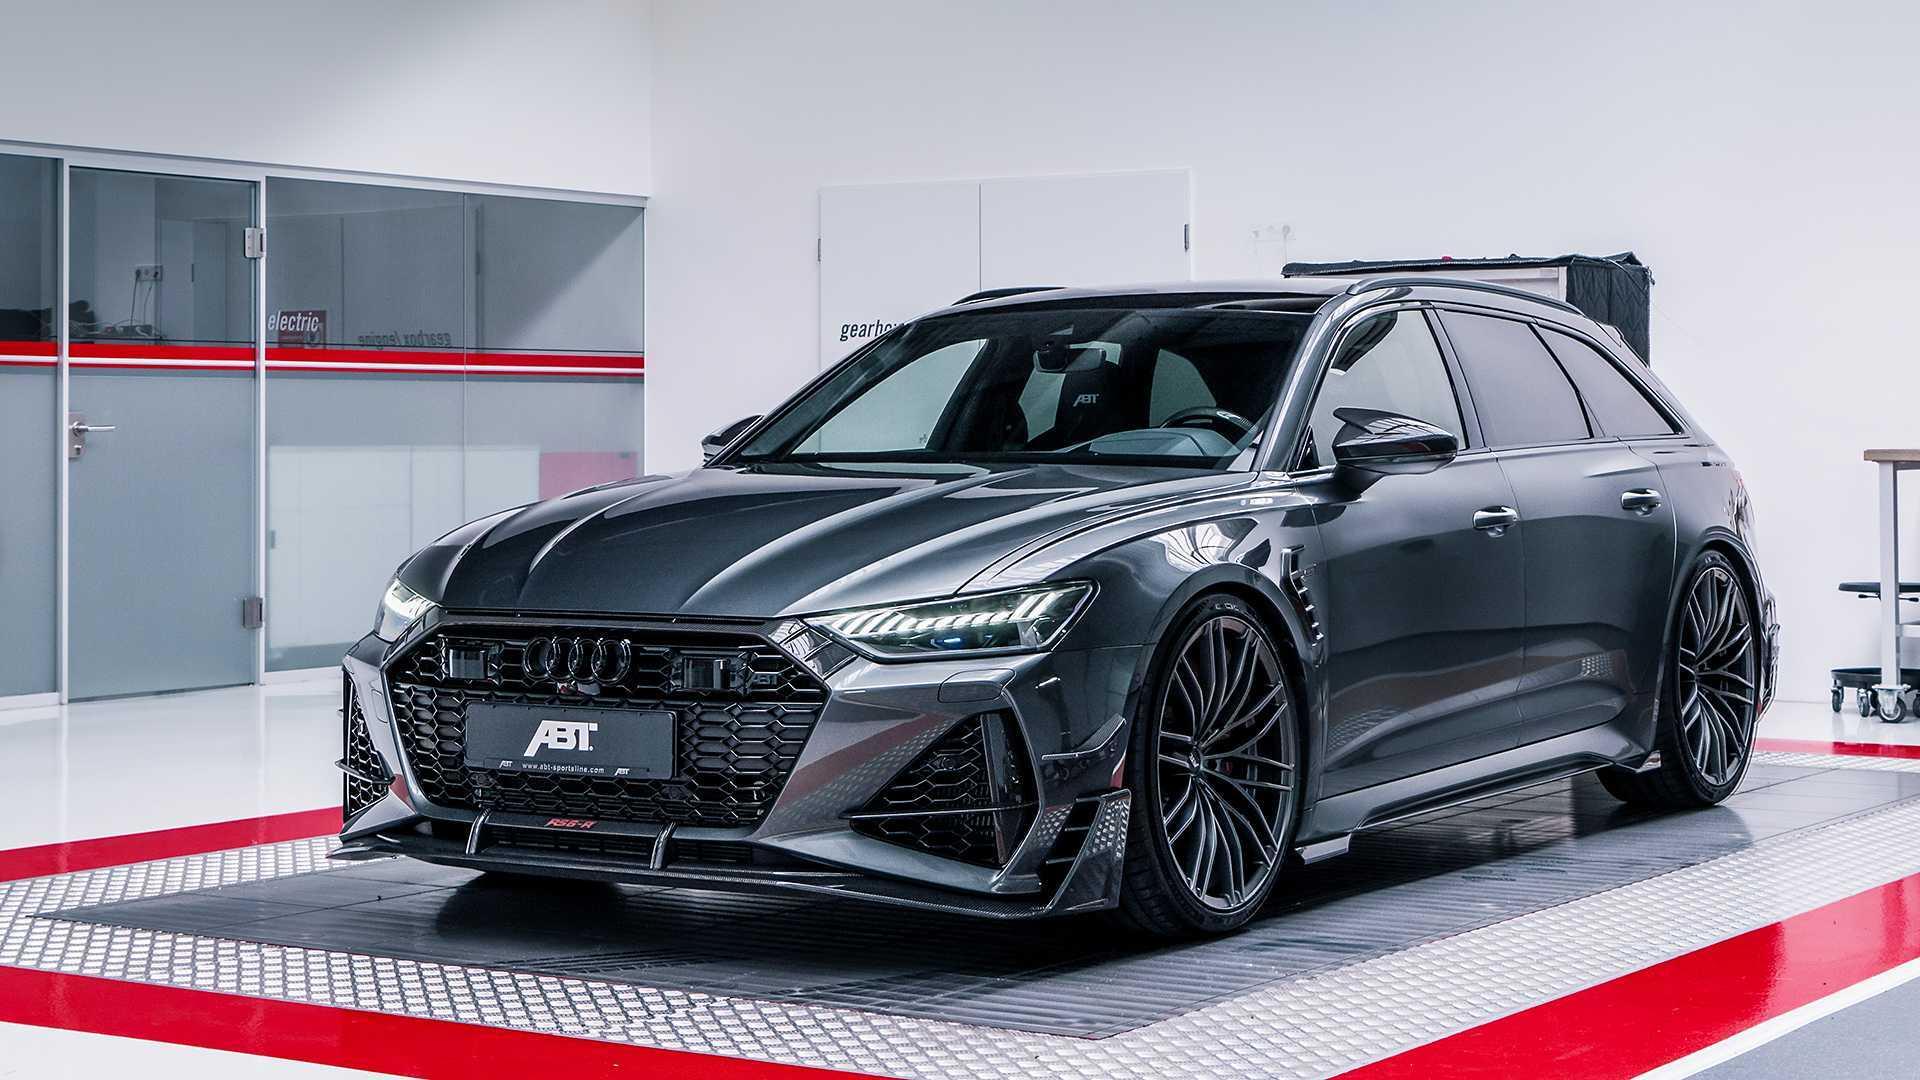 Kelebihan Audi Rs6 Sportback Top Model Tahun Ini